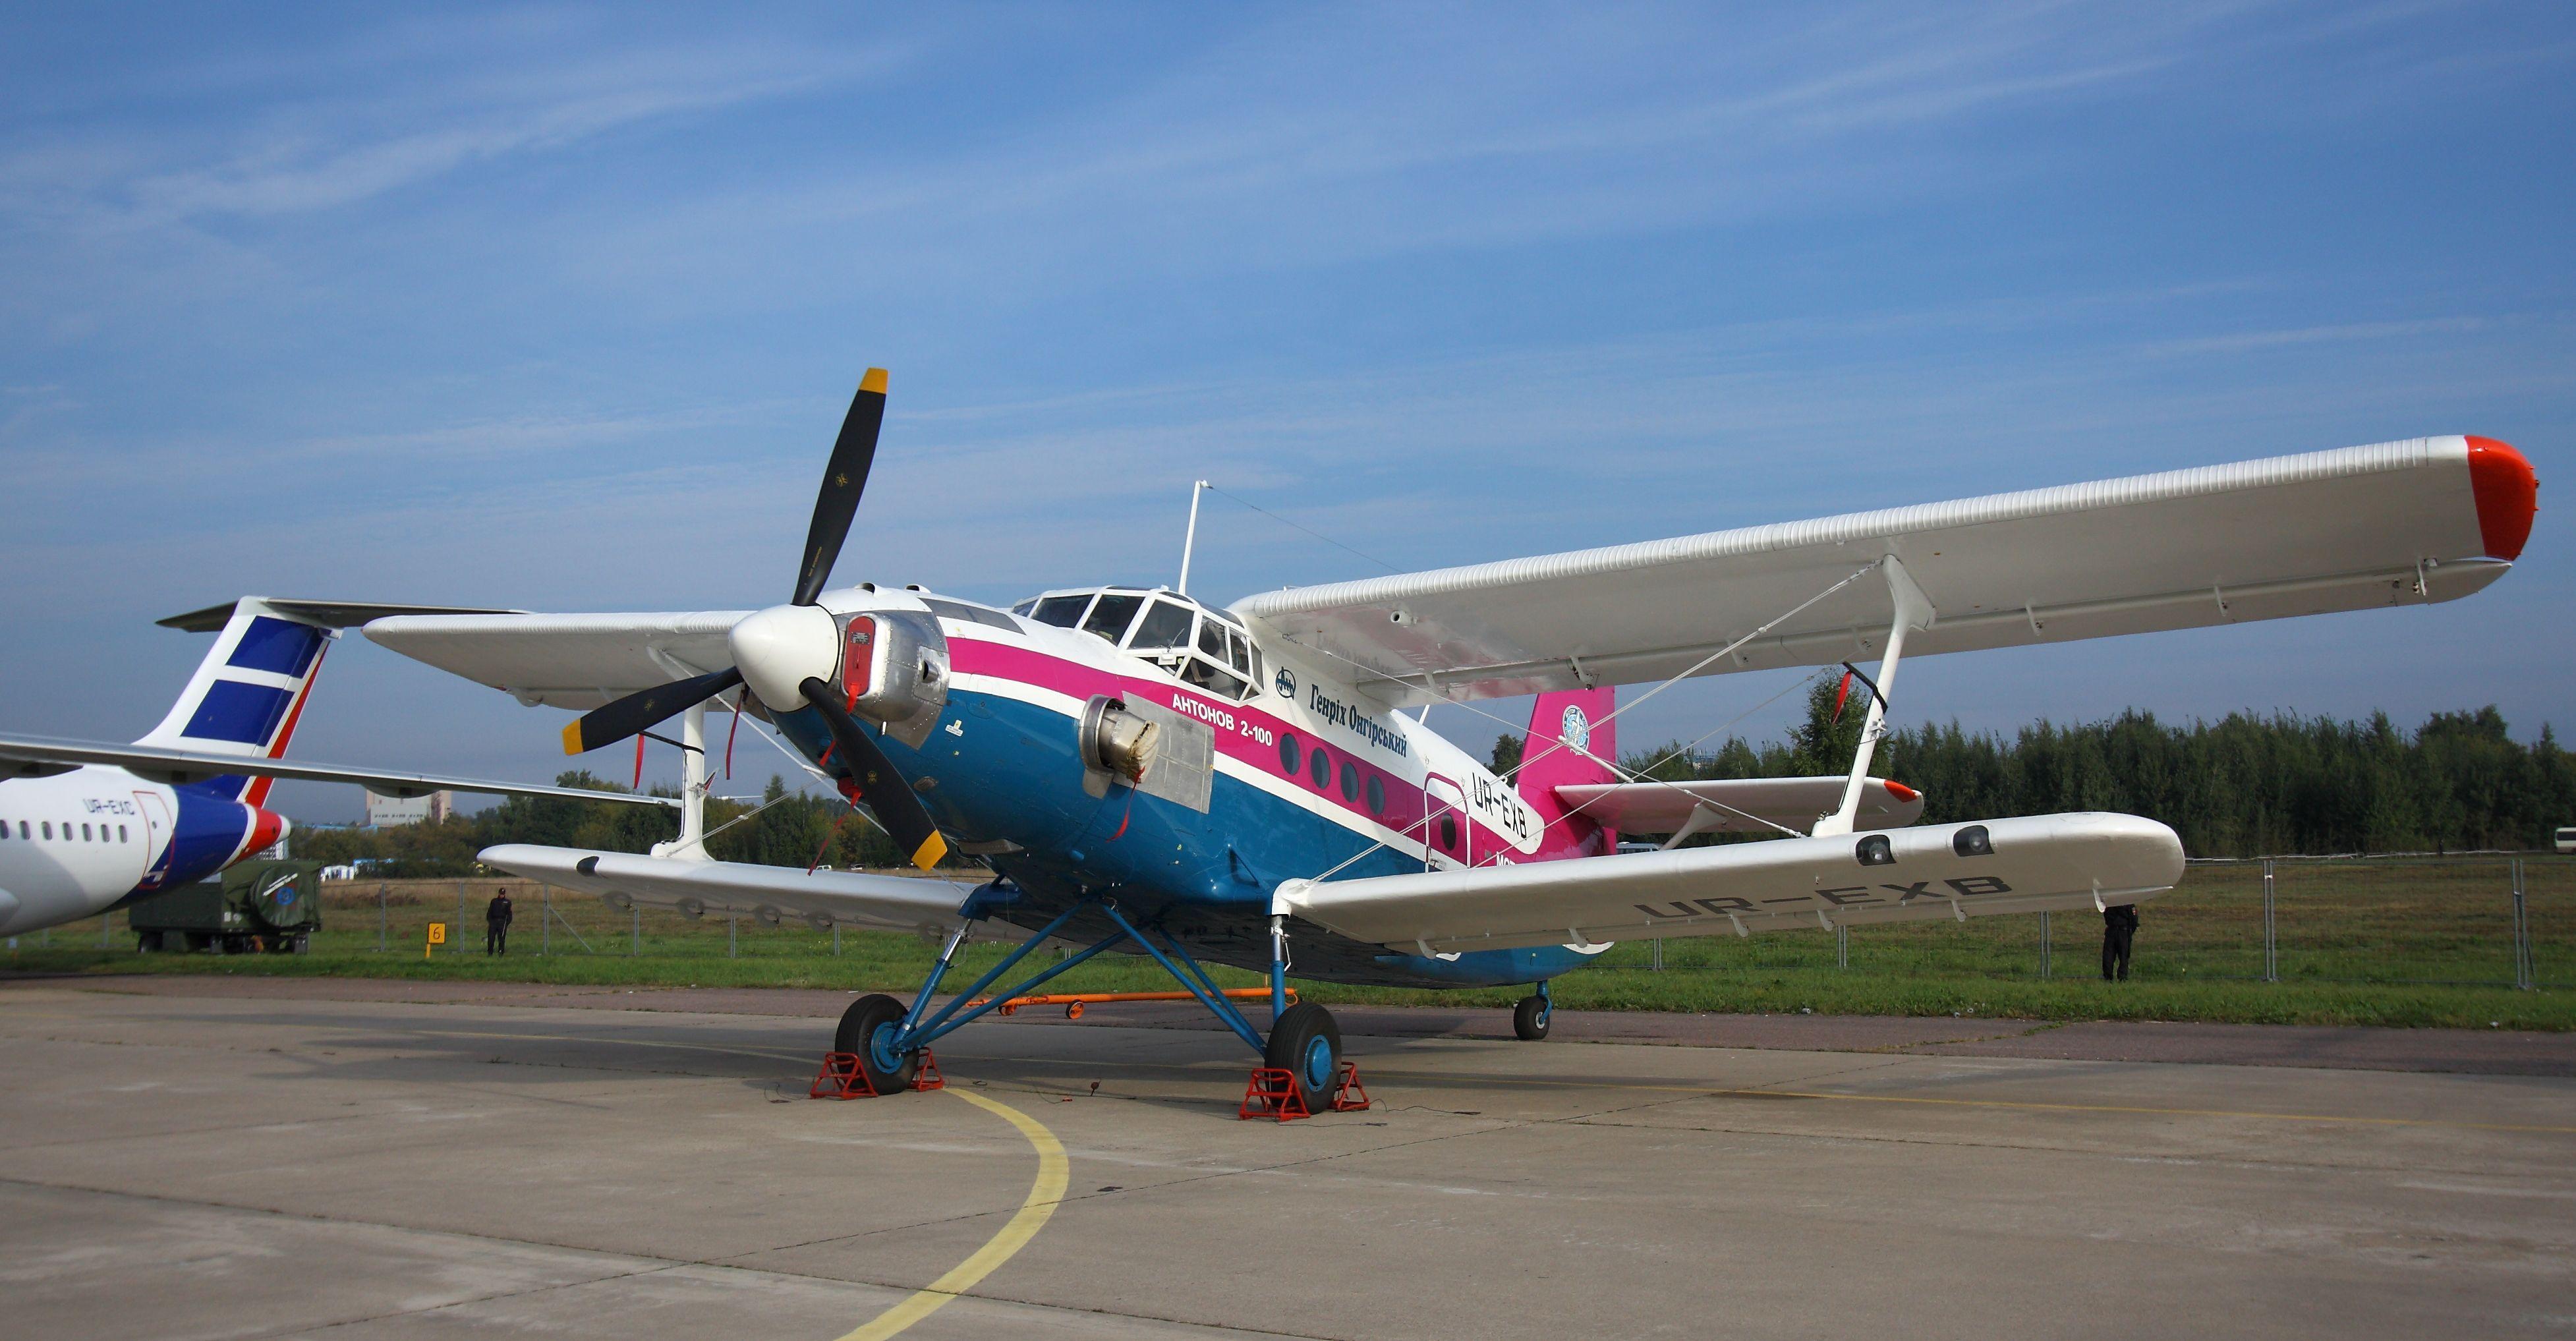 File:Antonov An-2-100 at the MAKS-2013 (01).jpg - Wikimedia Commons